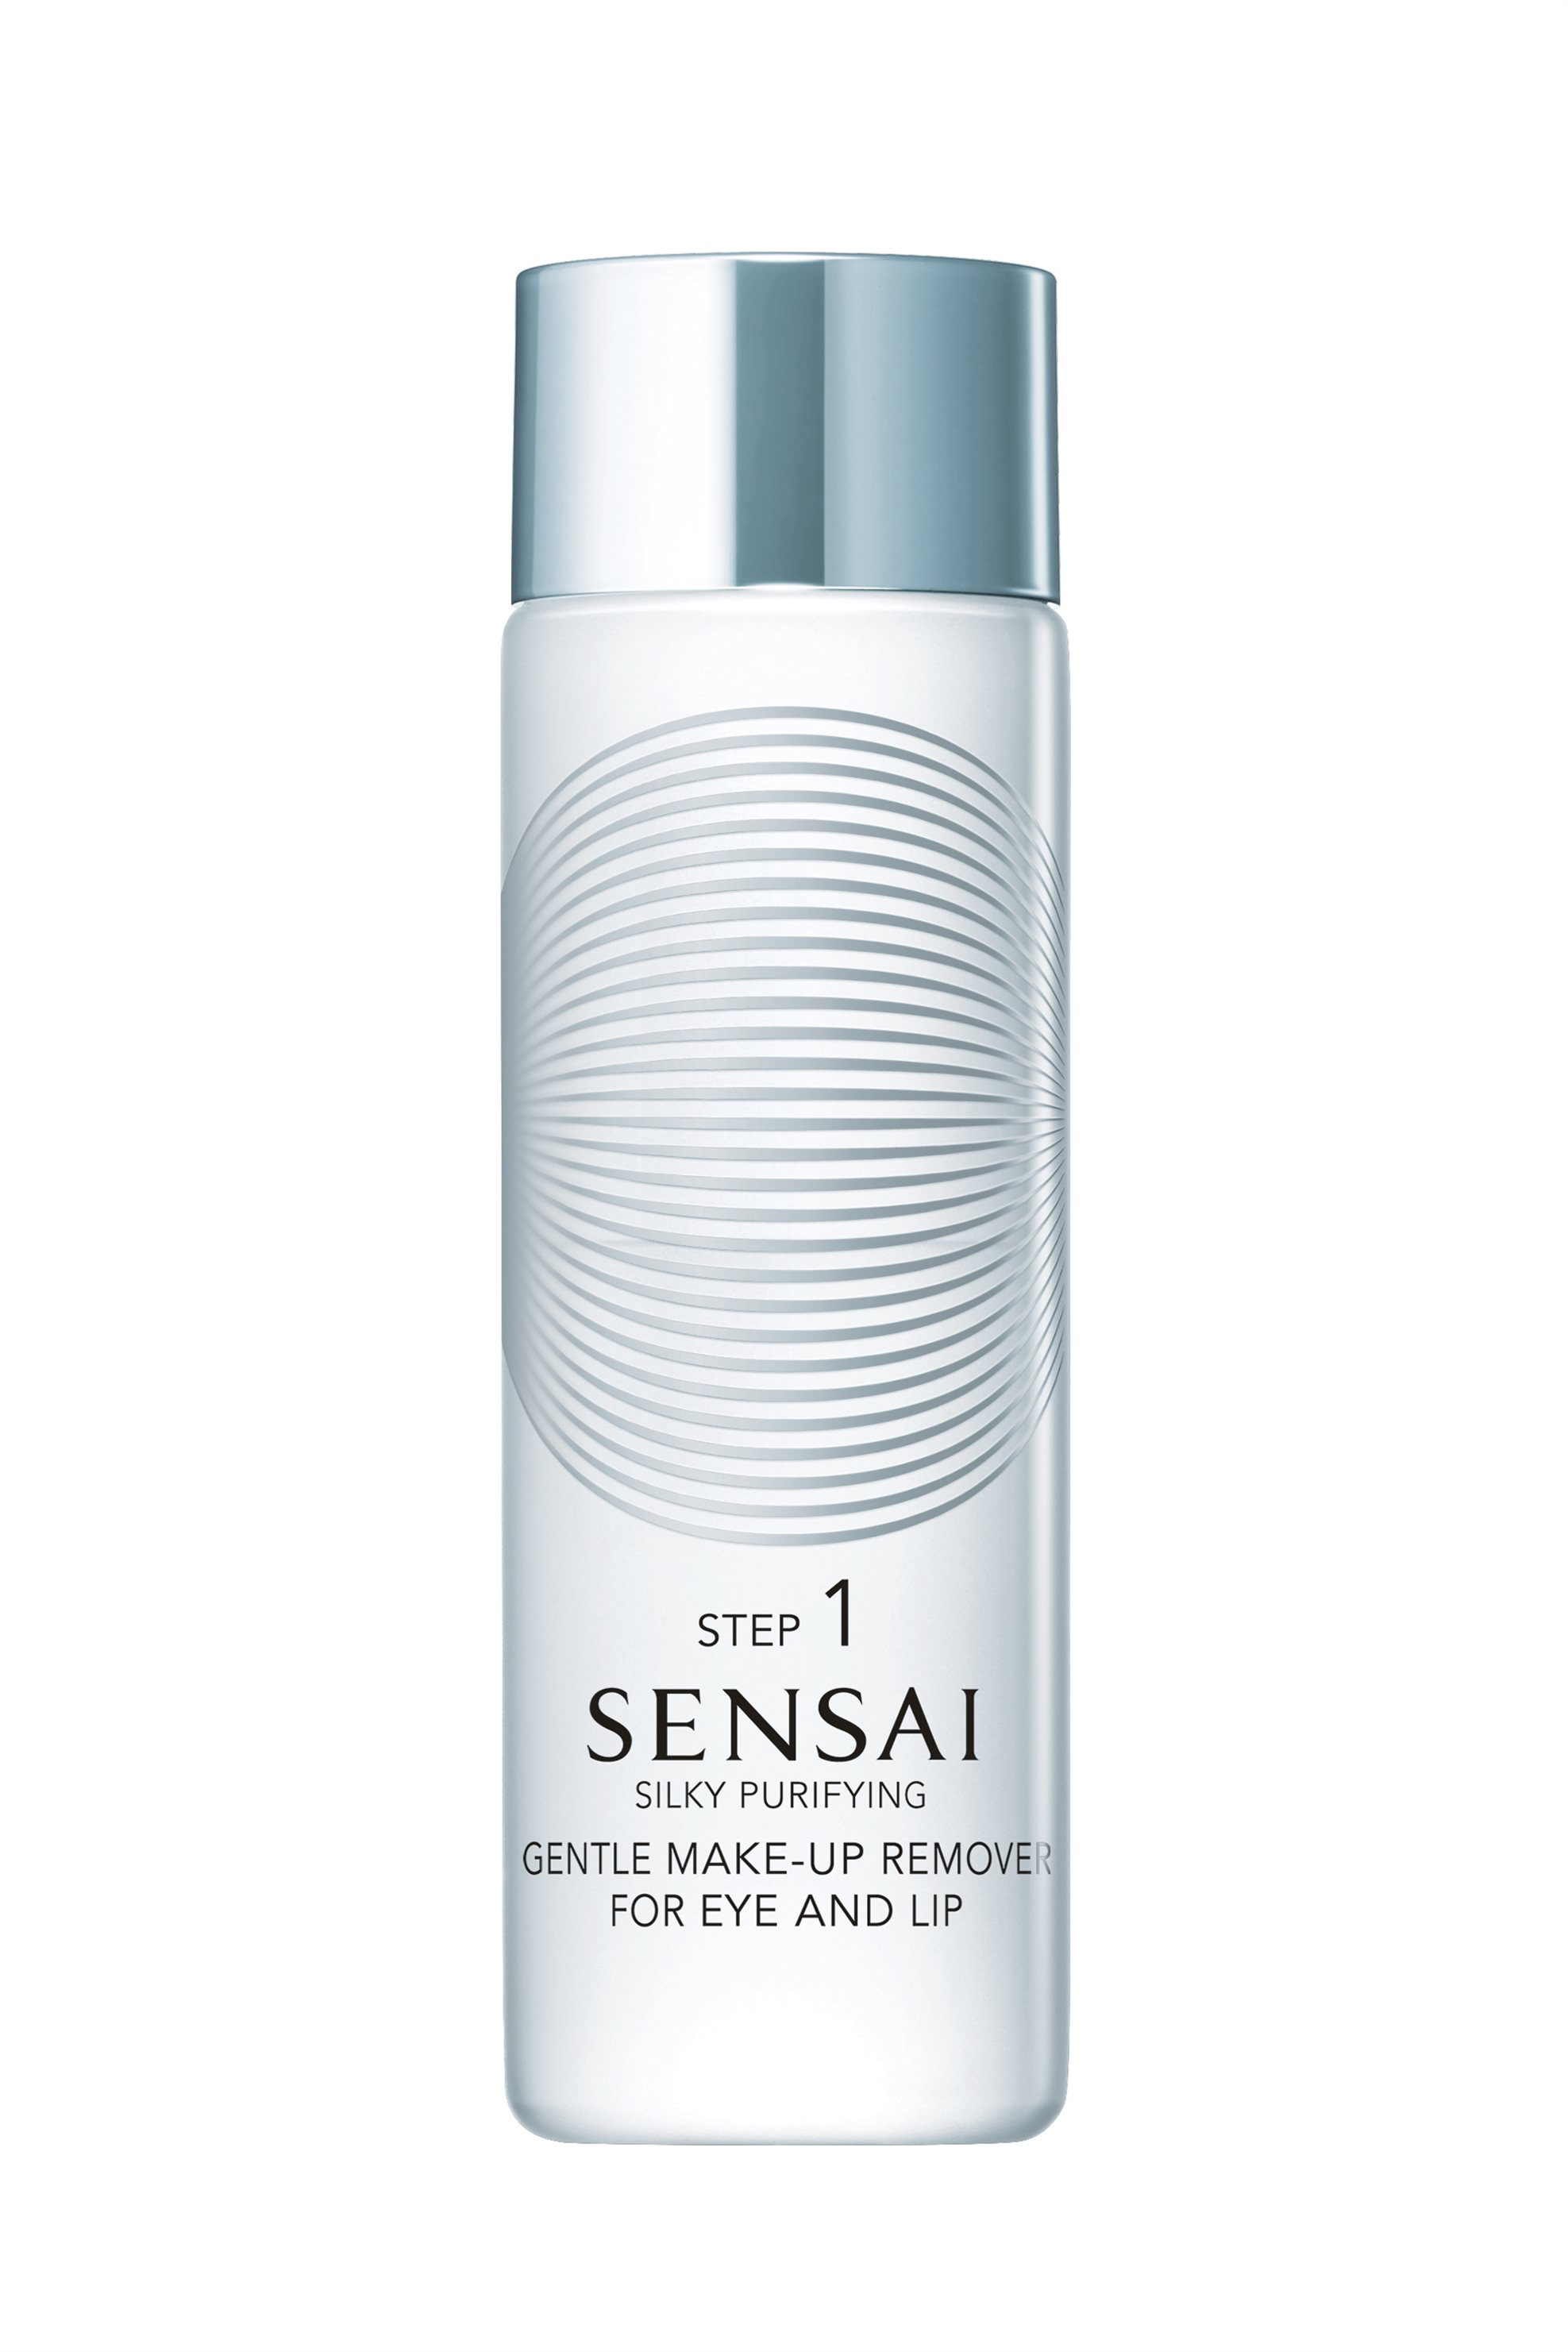 Sensai Silky Purifying Step 1 Make-up Remover for Eye & Lip ...